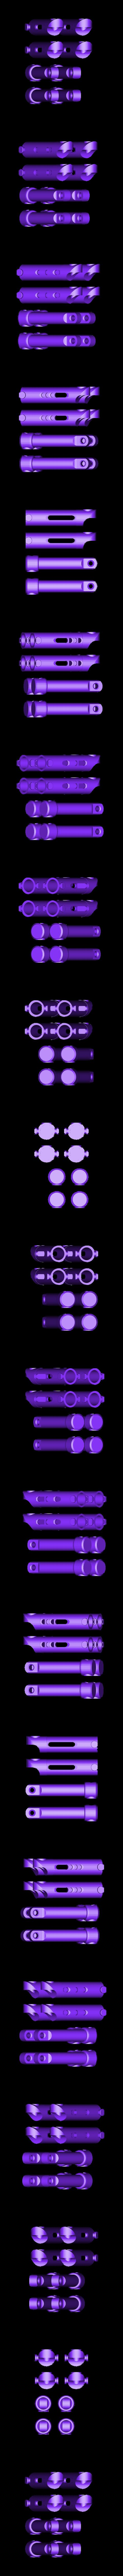 Shock01.STL Download free STL file Lynx - Fully 3D-printable 1/10 4wd buggy • Object to 3D print, tahustvedt